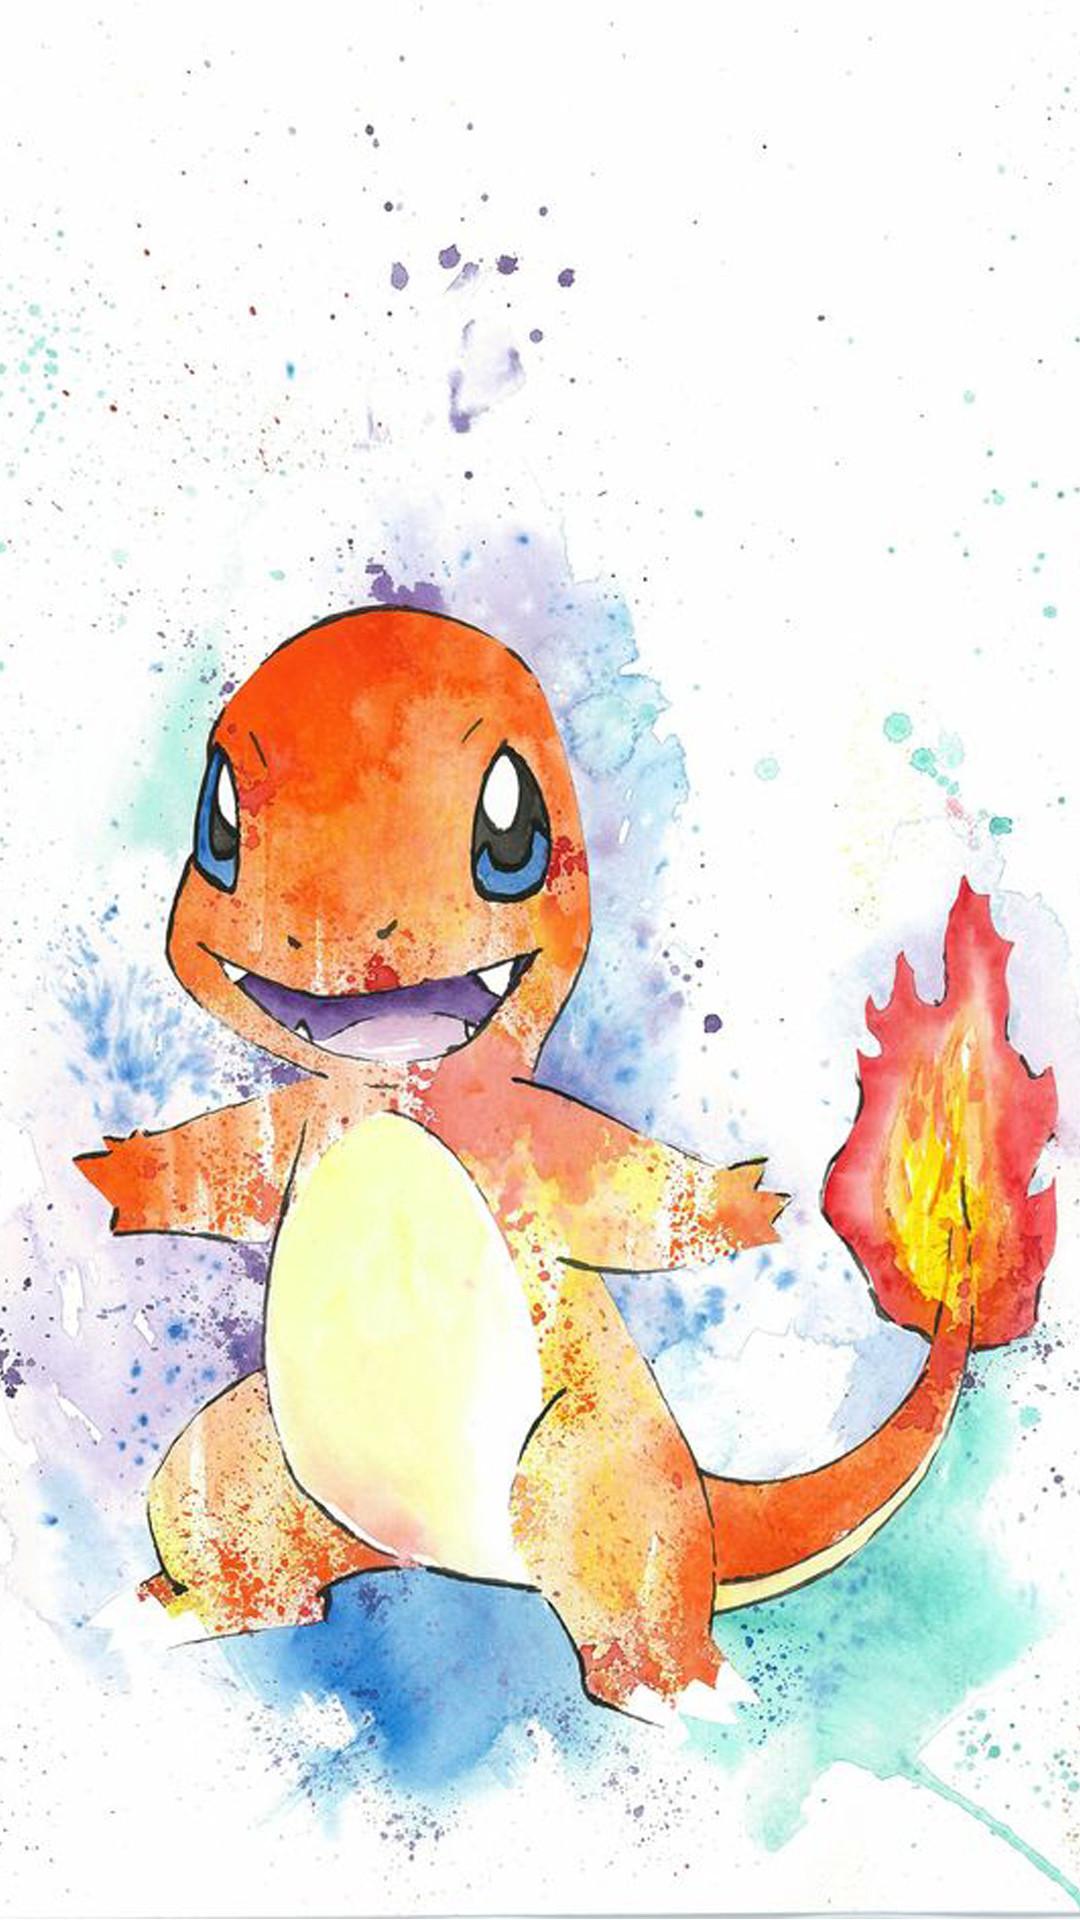 Charmander Pokemon Go iphone wallpaper quotes